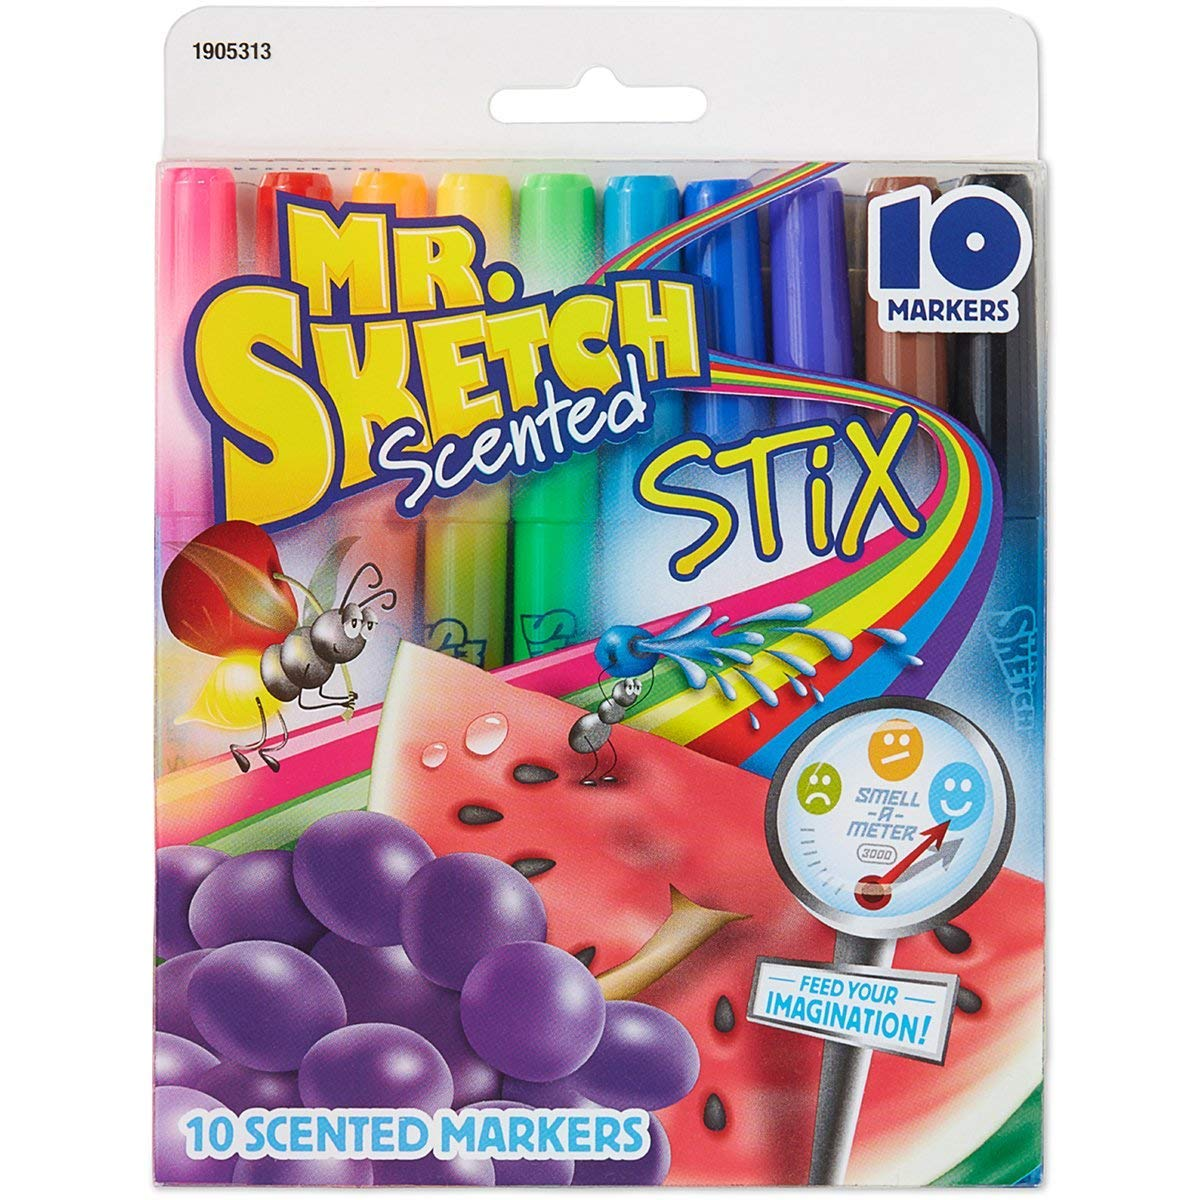 Mr. Sketch Stix Scented Markers, Fine Tip, Set of 10, Assorted Colors Case of 6 Packs